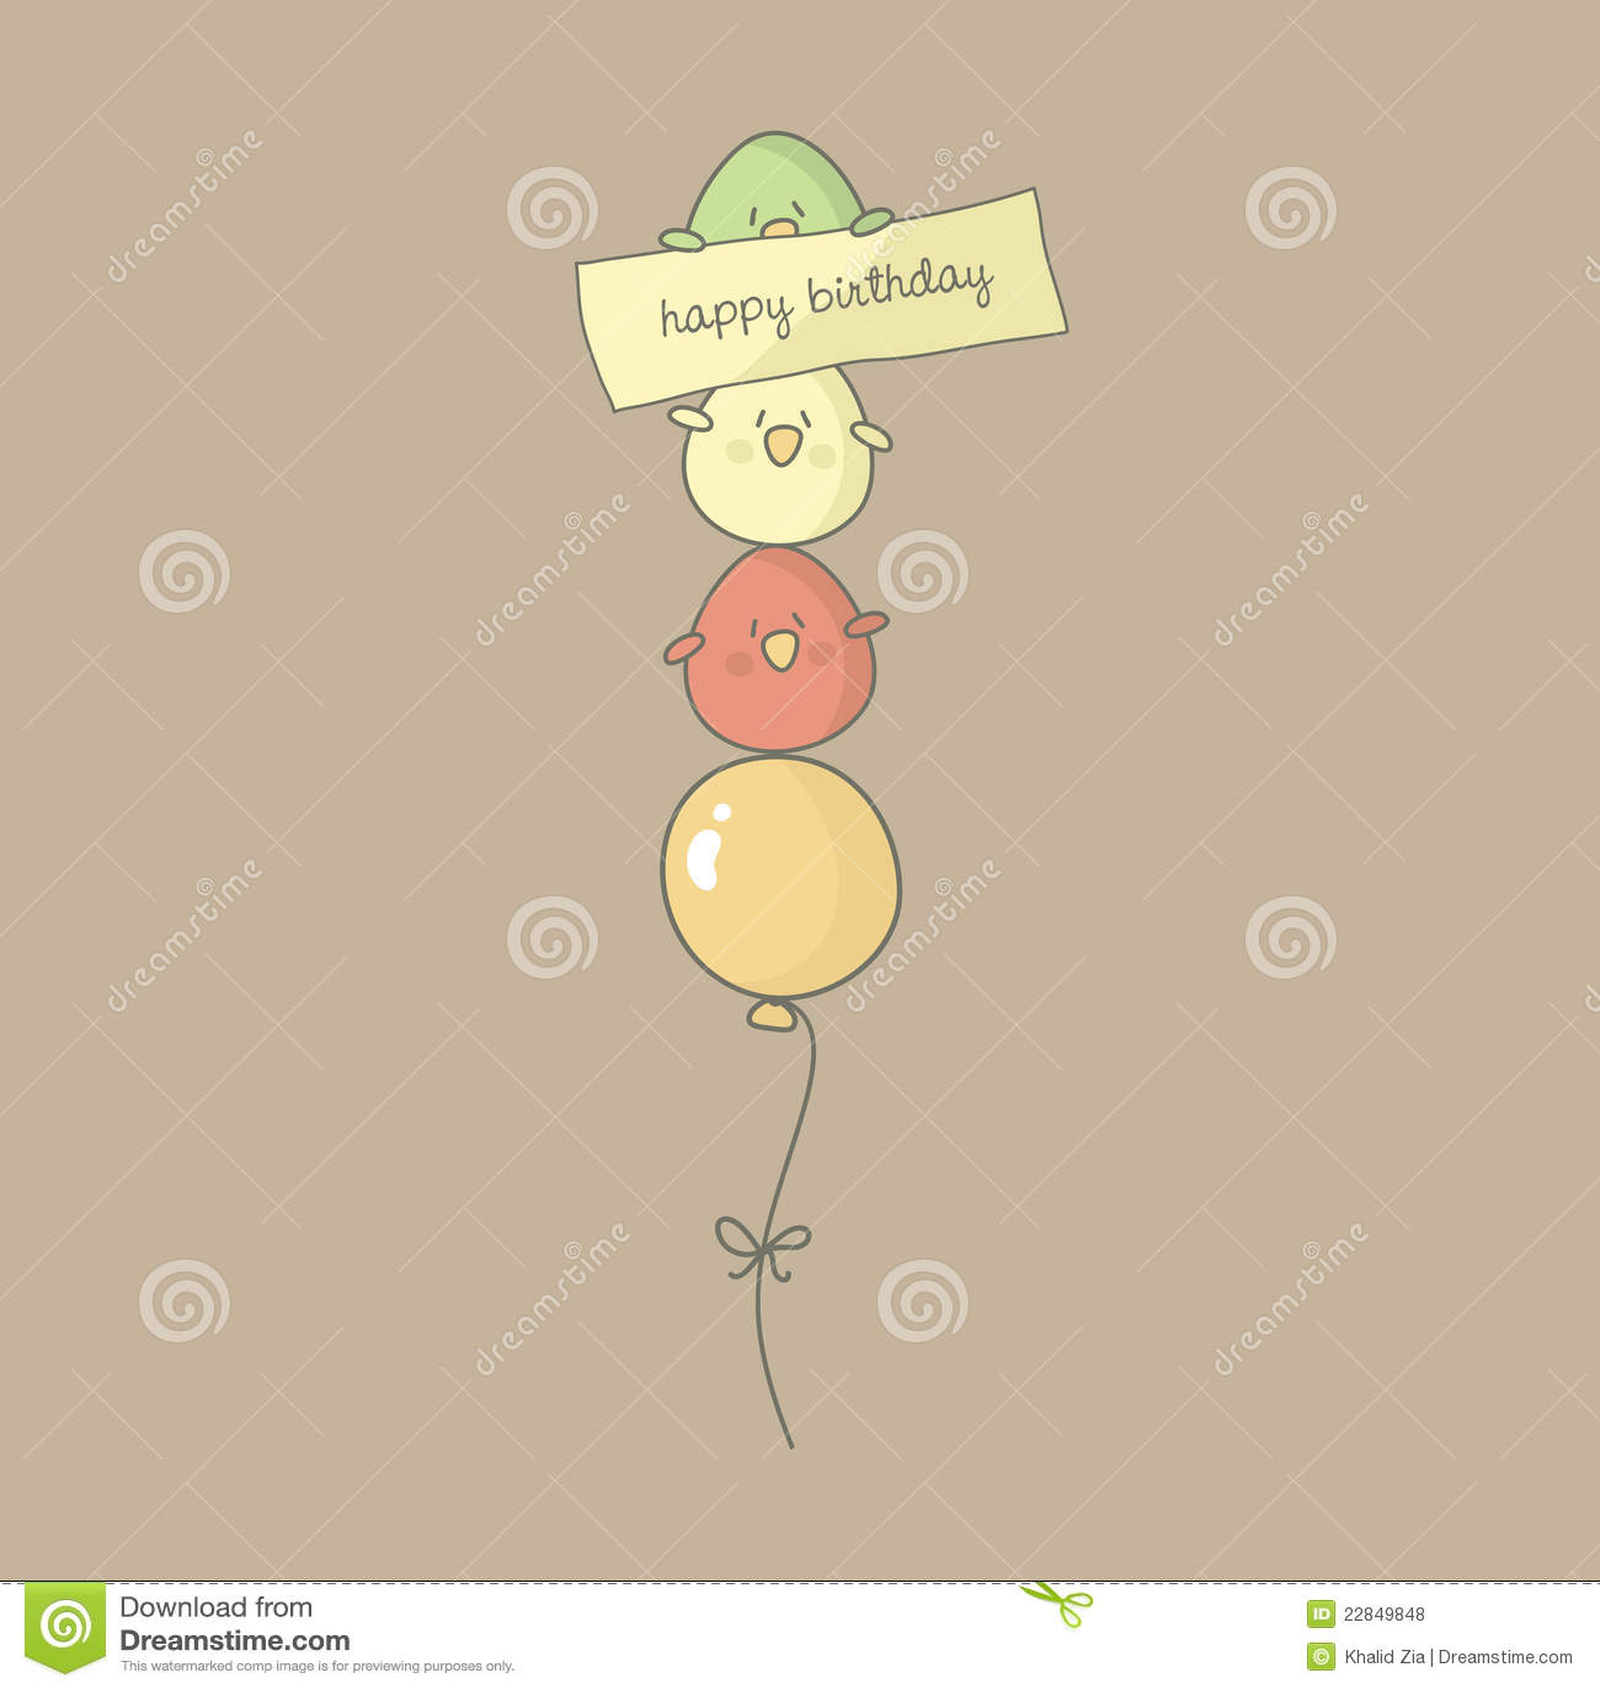 Bird Birthday Greeting Card Stock Vector Illustration Of Animal